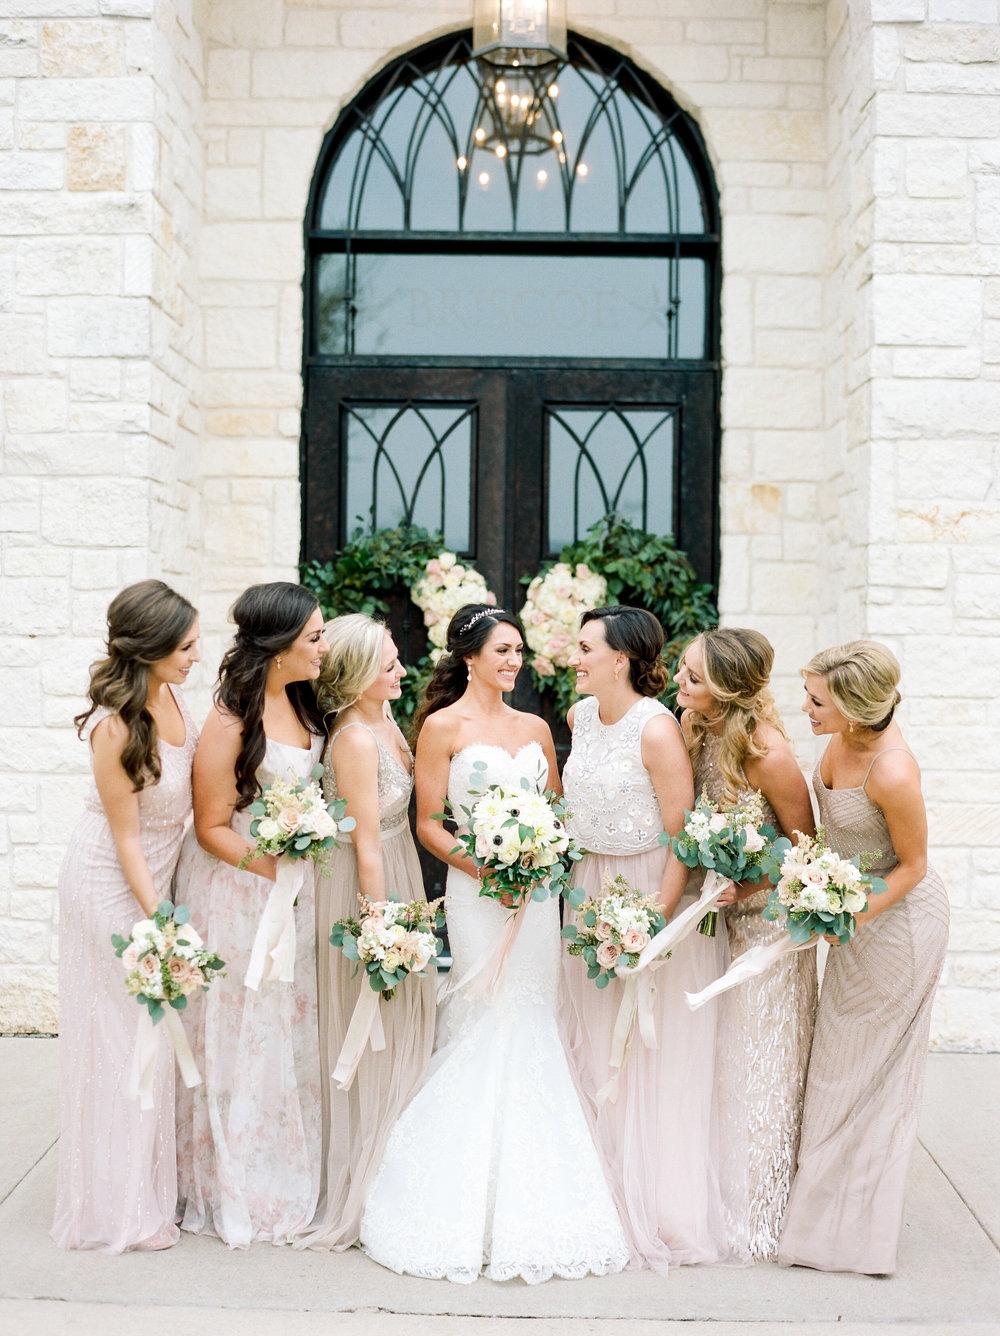 Briscoe-Manor-Houston-Wedding-Photographer-Modern-Luxury-Weddings-Dana-Fernandez-Photograpy-Fine-Art-Photographer-Houston-Film-Destination-PNW-Wedding-Photographer-6.jpg